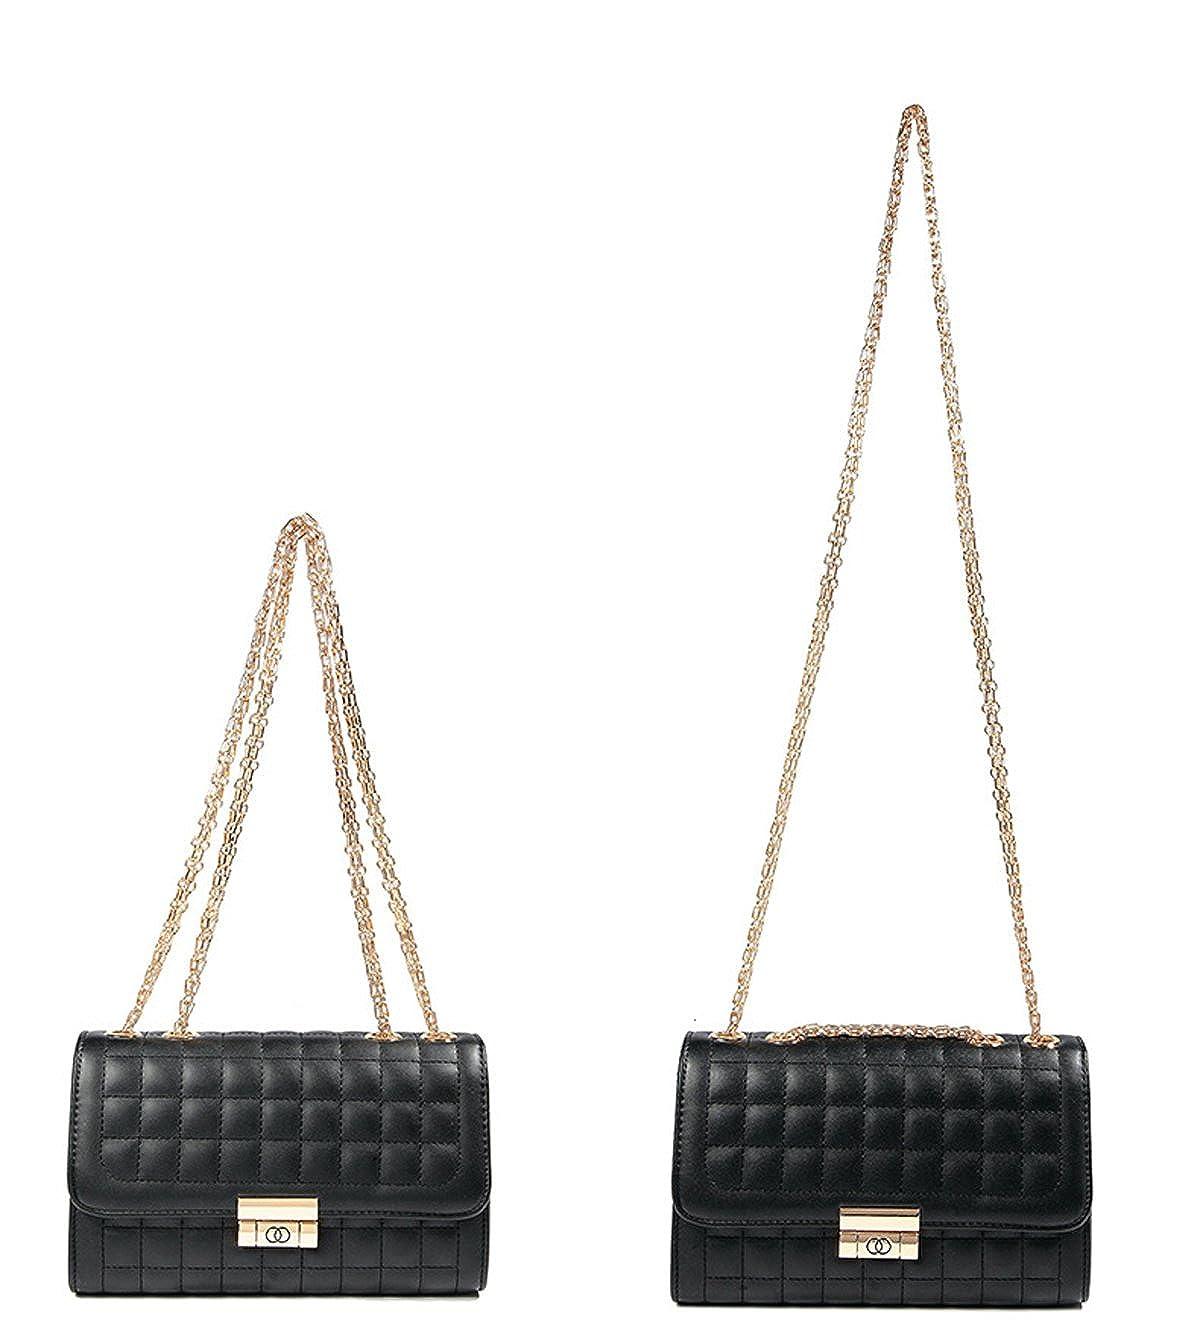 ee475c0d6 Amazon.com: Women's Classic Quilted Crossbody Purse Shoulder Bags Golden  Chain Satchel Handbags (Beige): Shoes